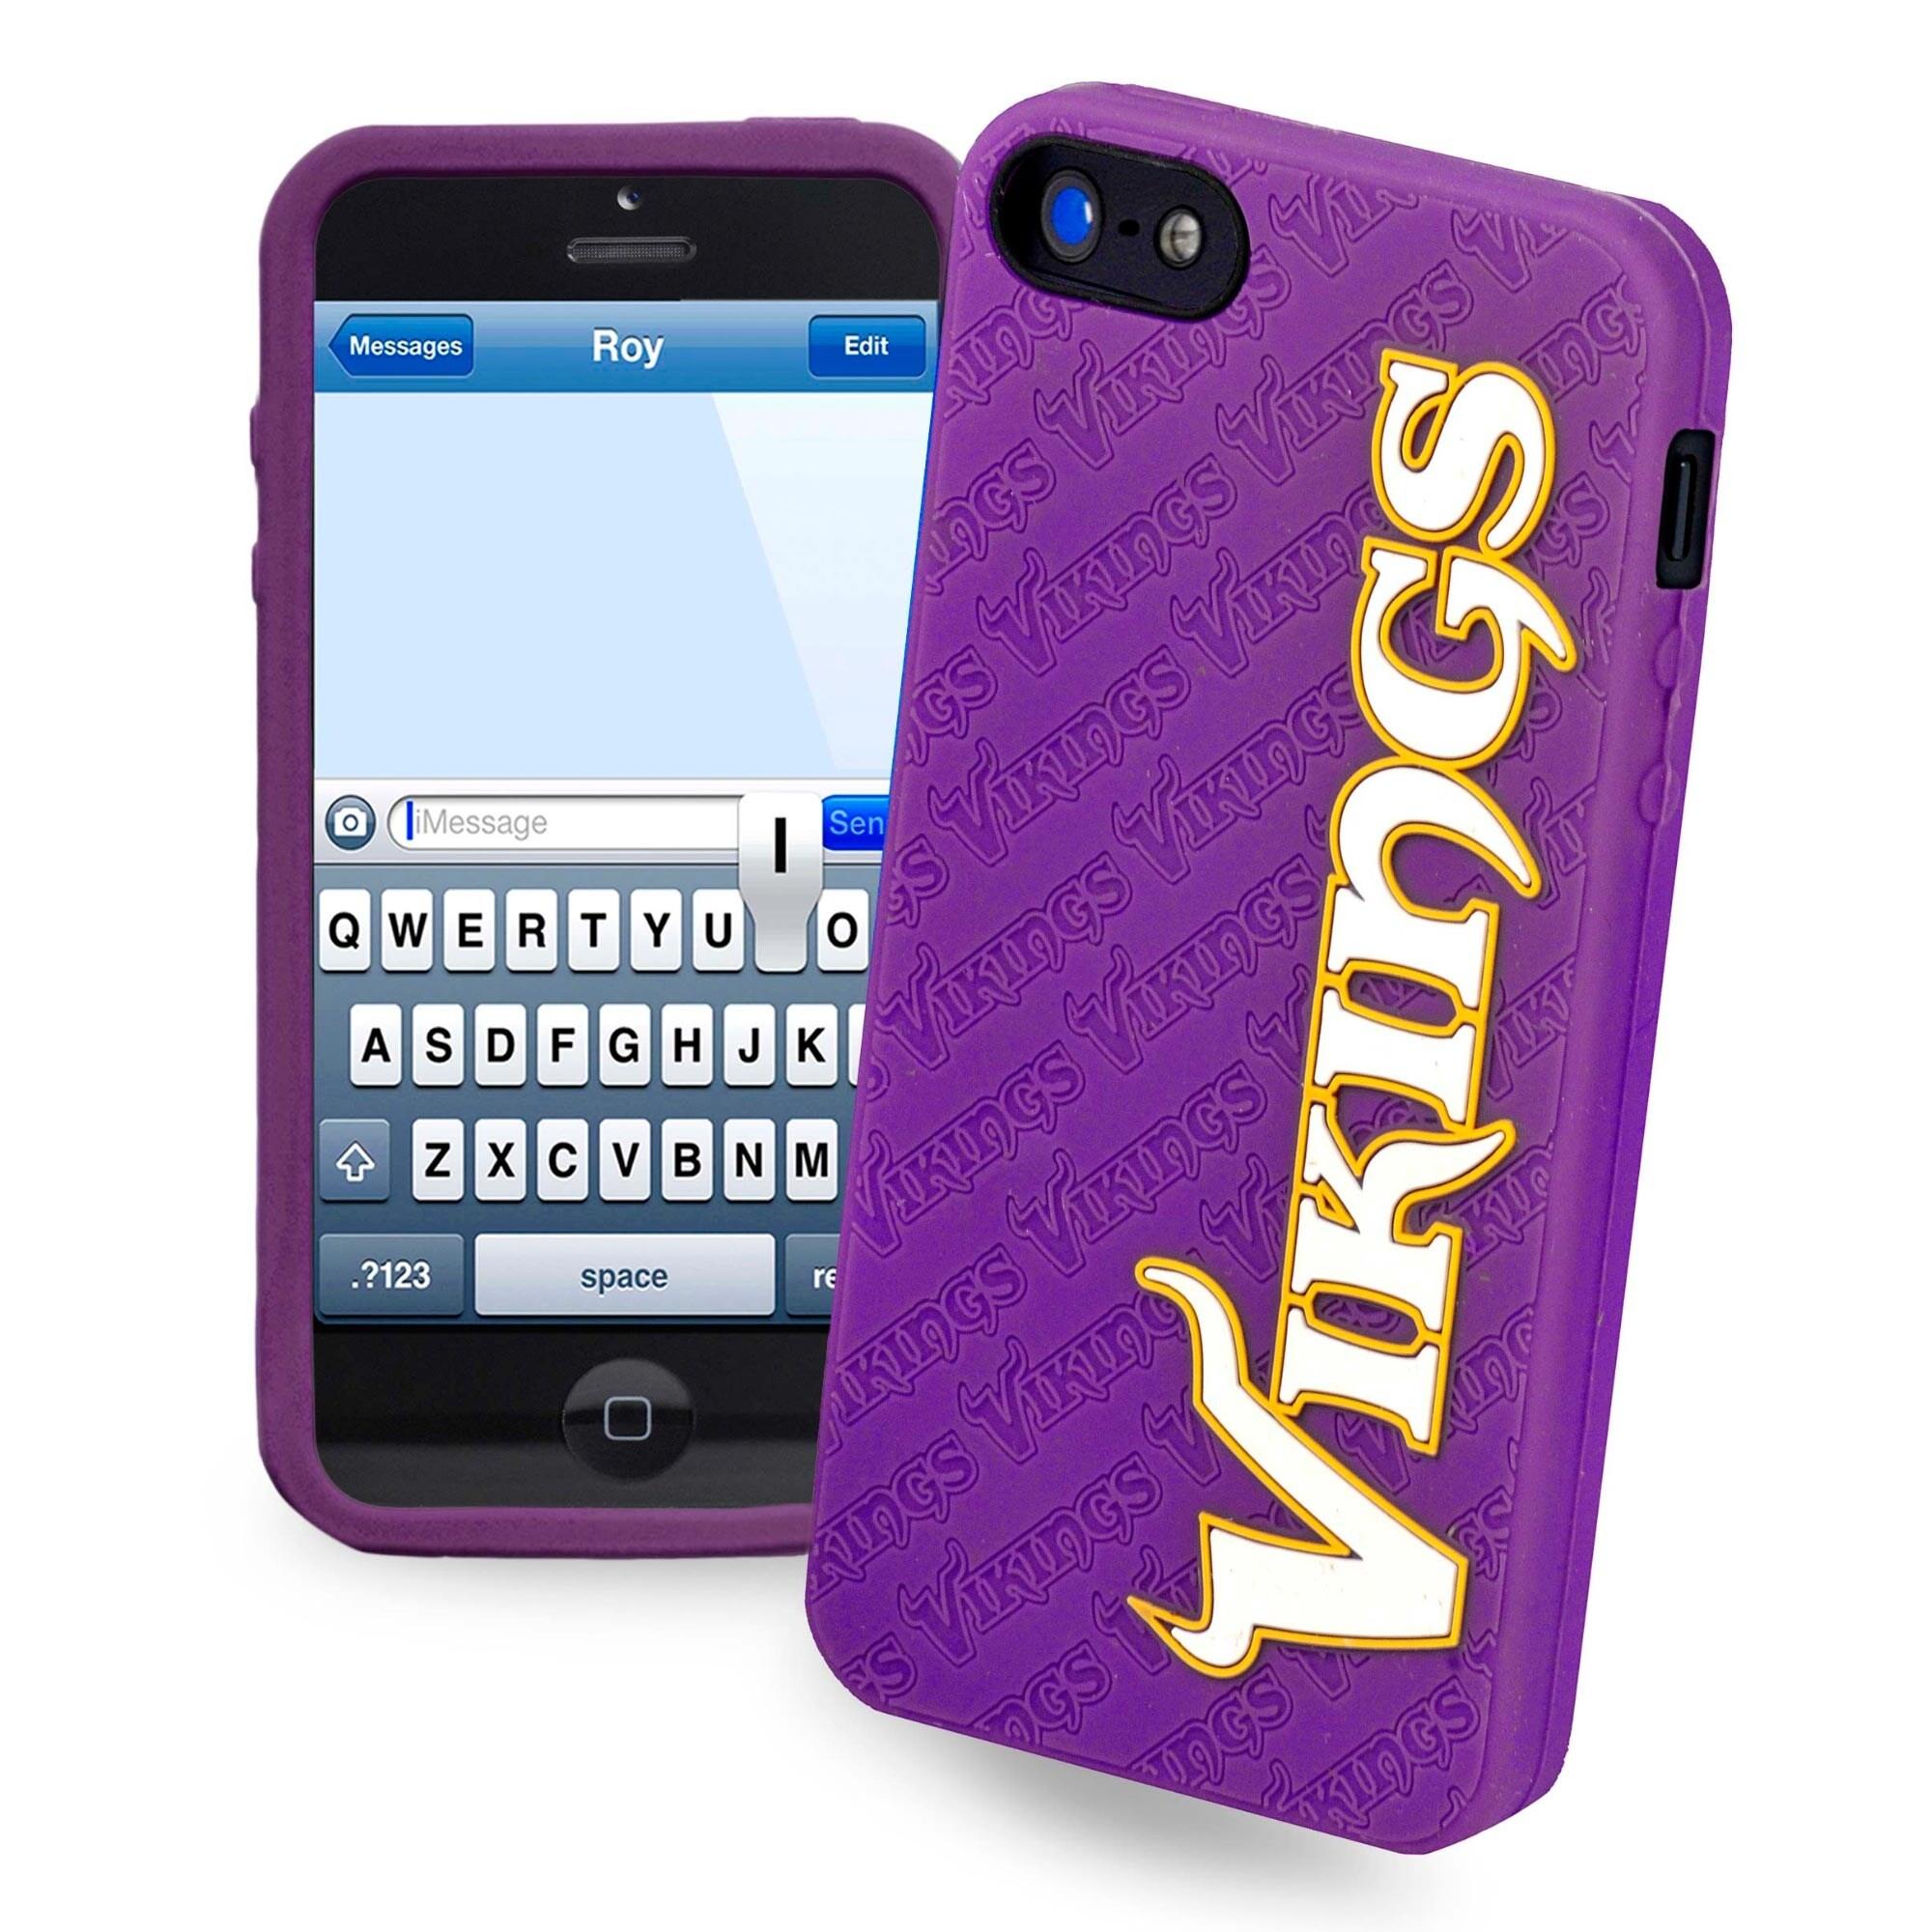 Minnesota Vikings Silicone iPhone 5 Cover - Purple